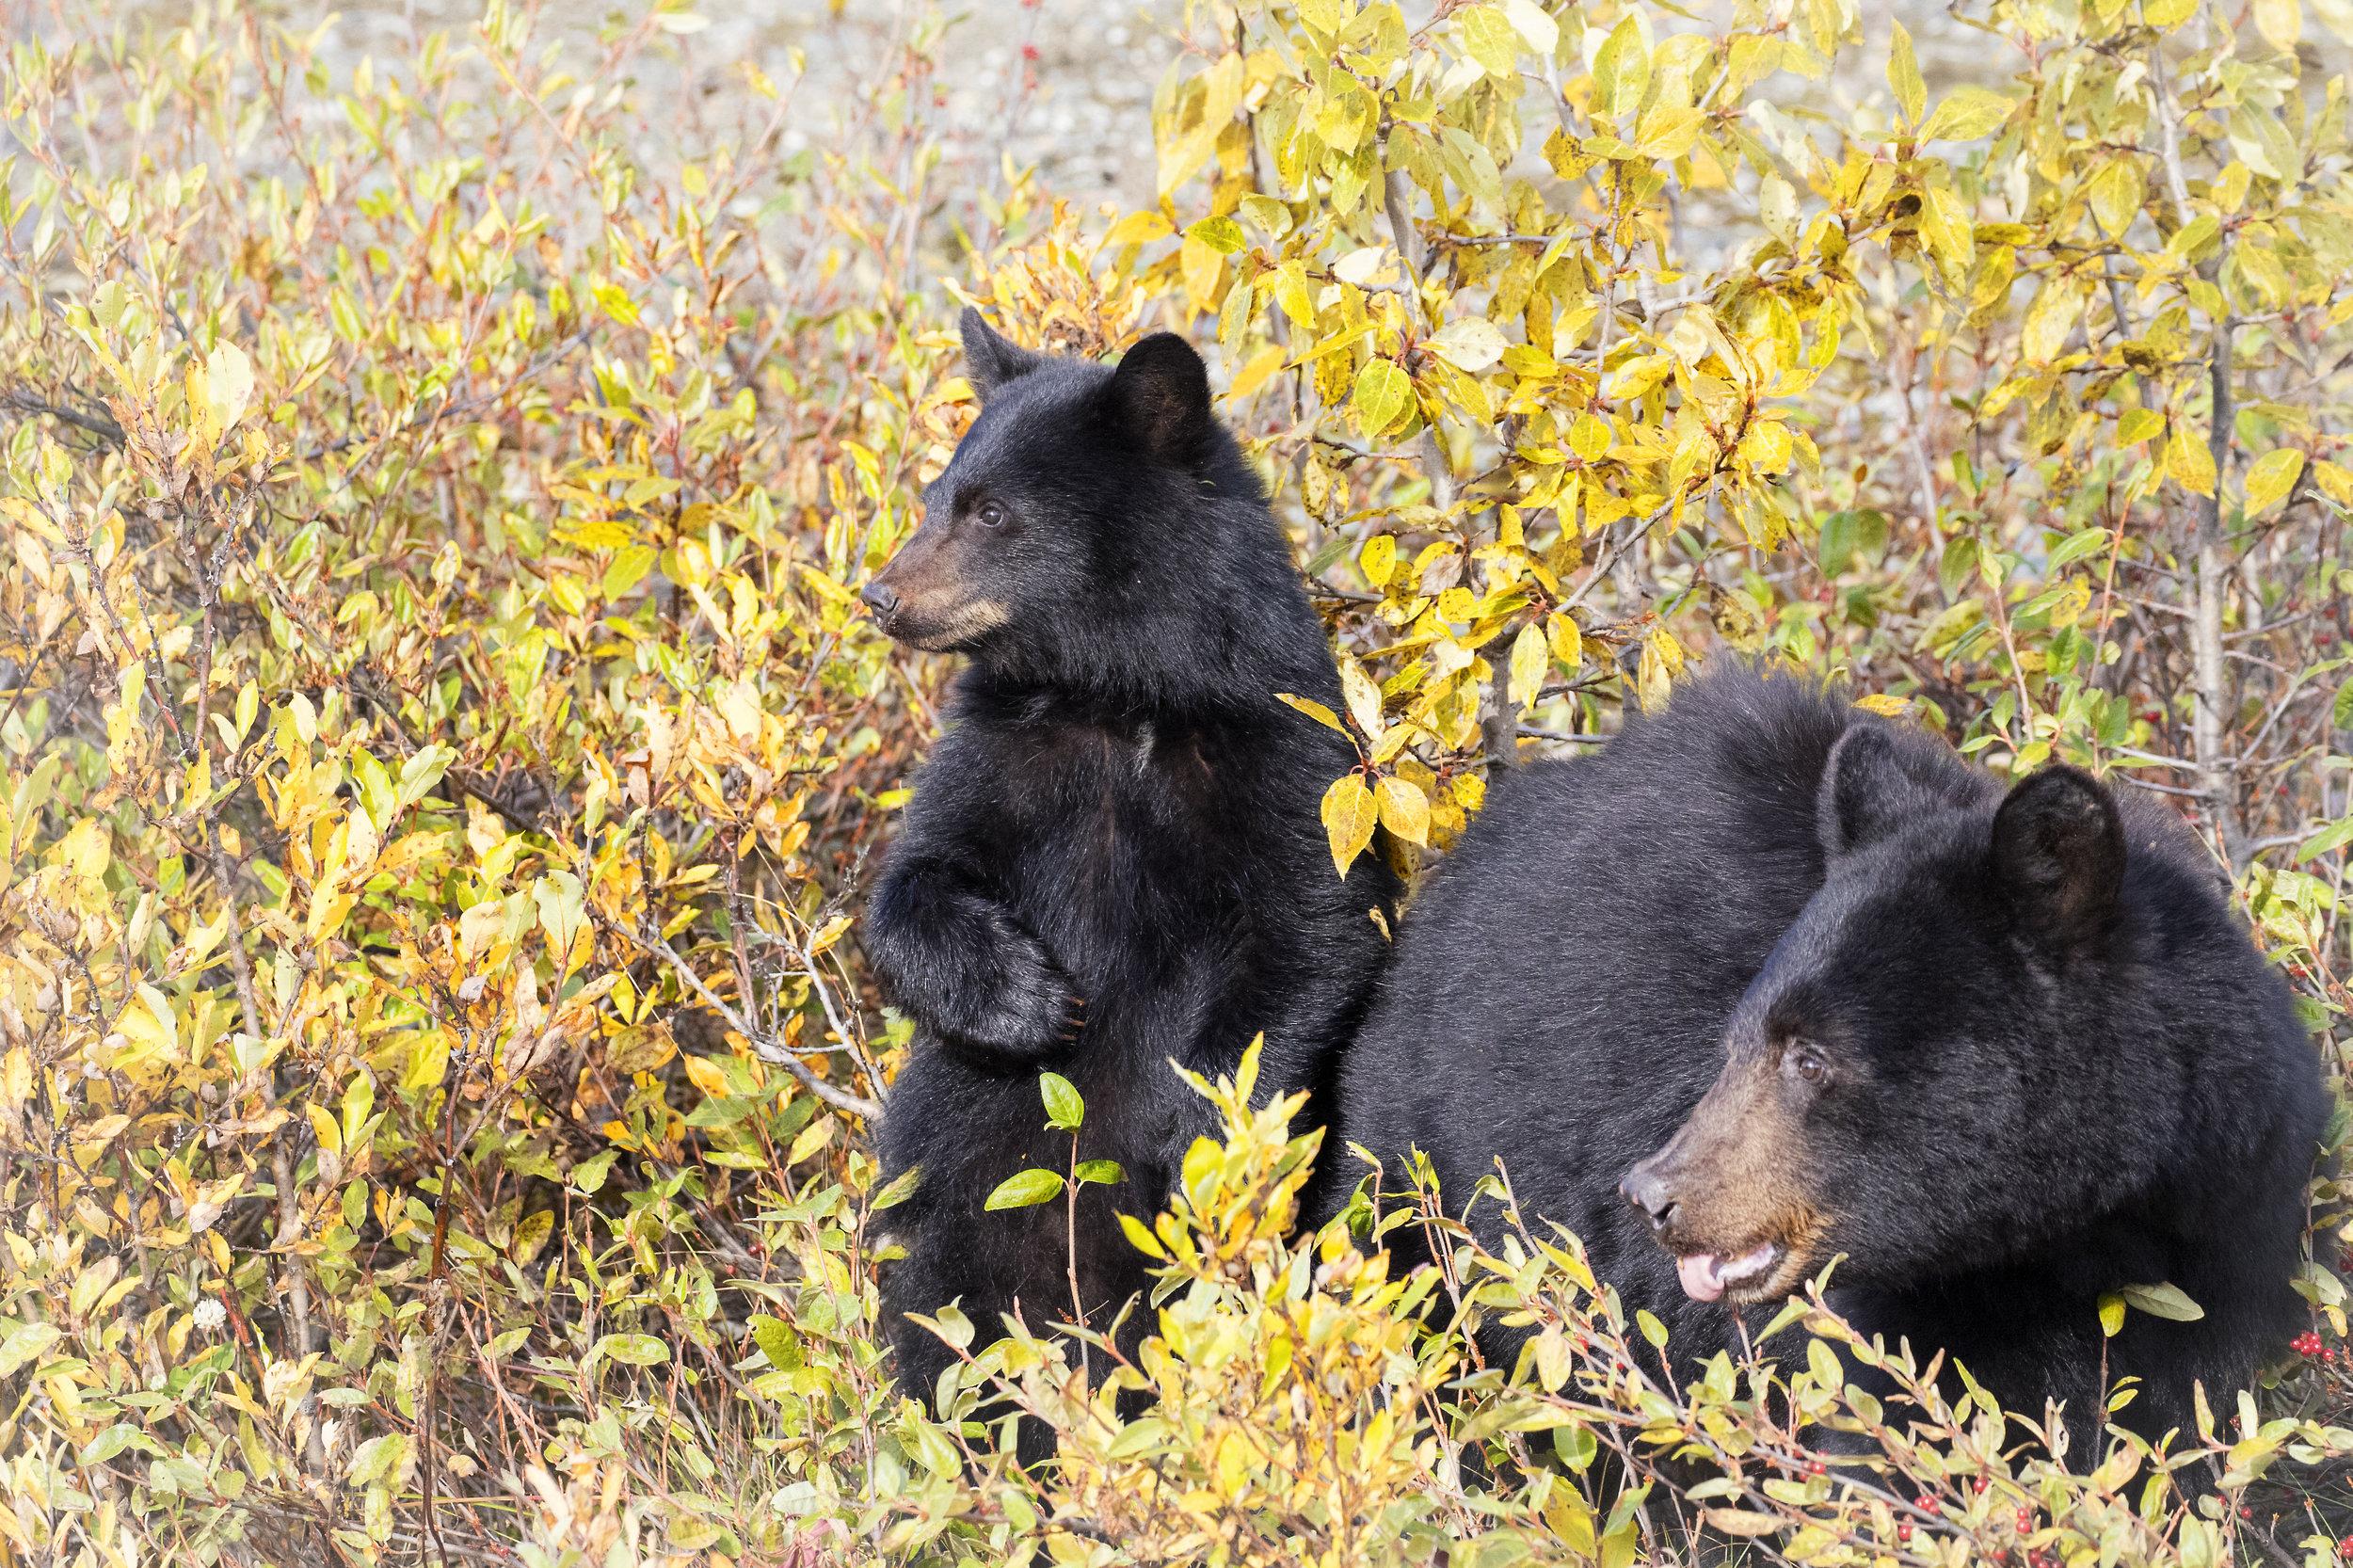 Momma Black Bear + Cub - Across the Blue Planet